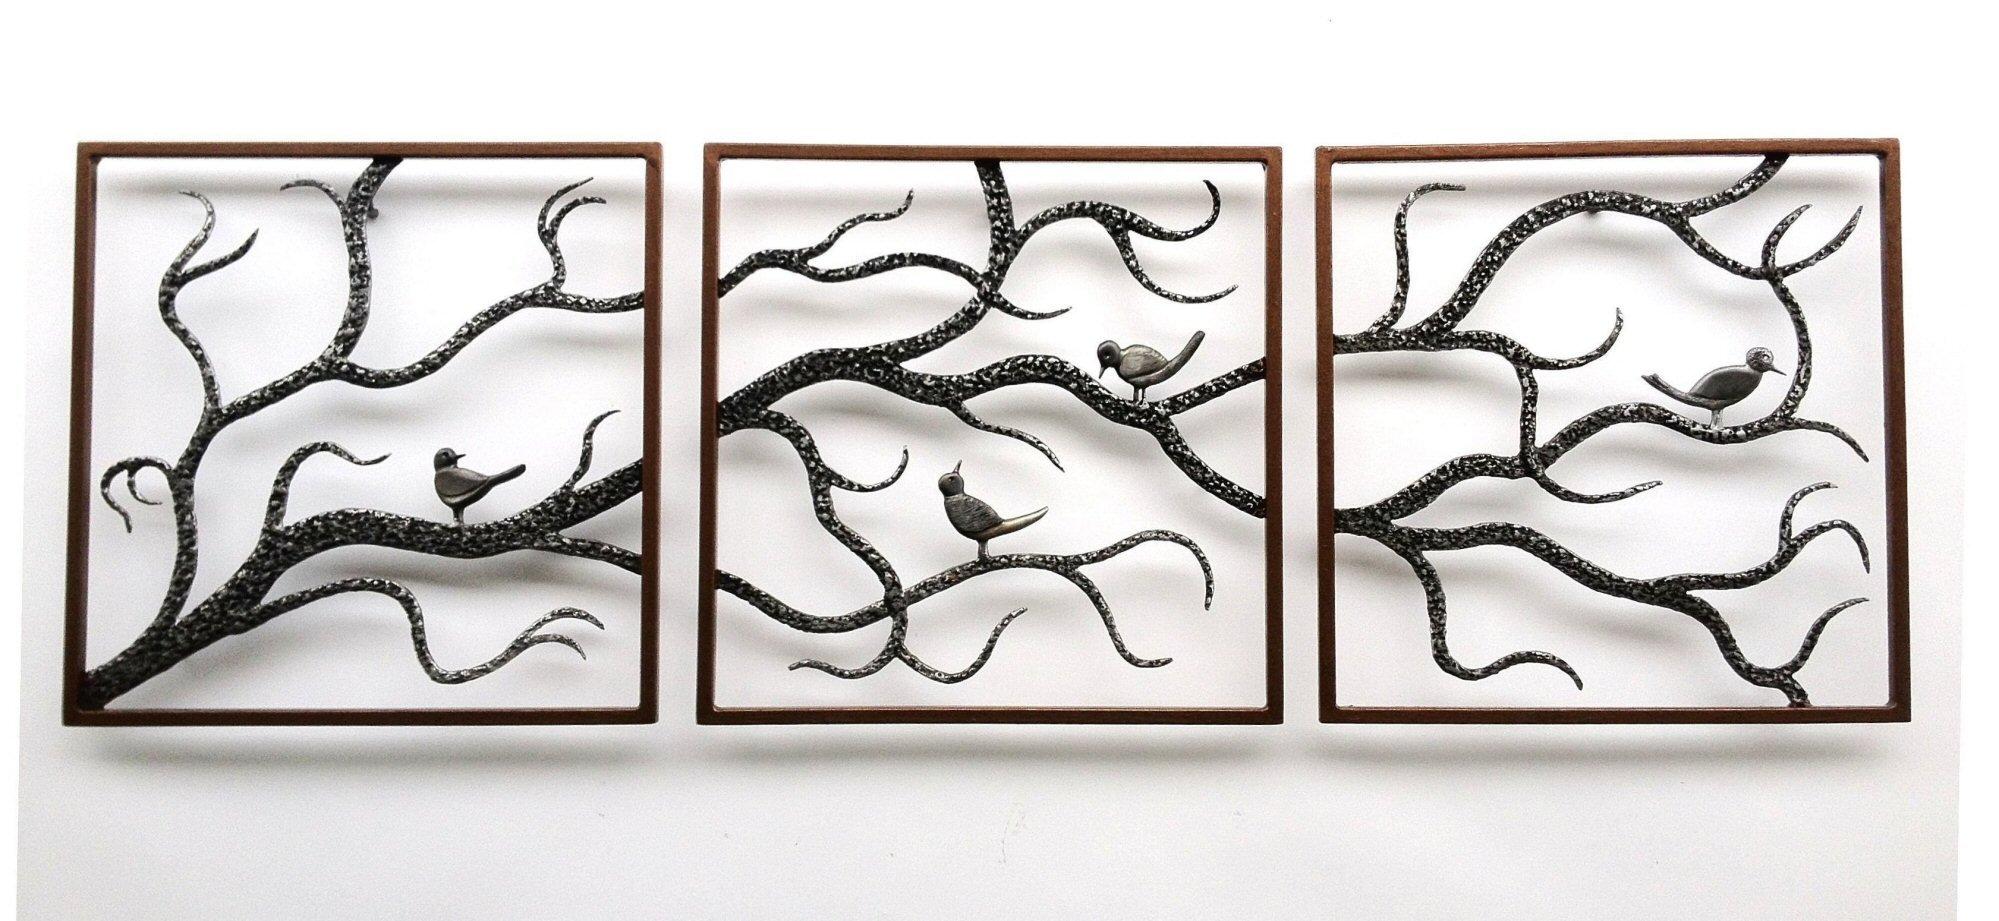 Friendship Tree By Bernard Collin (Metal Wall Art